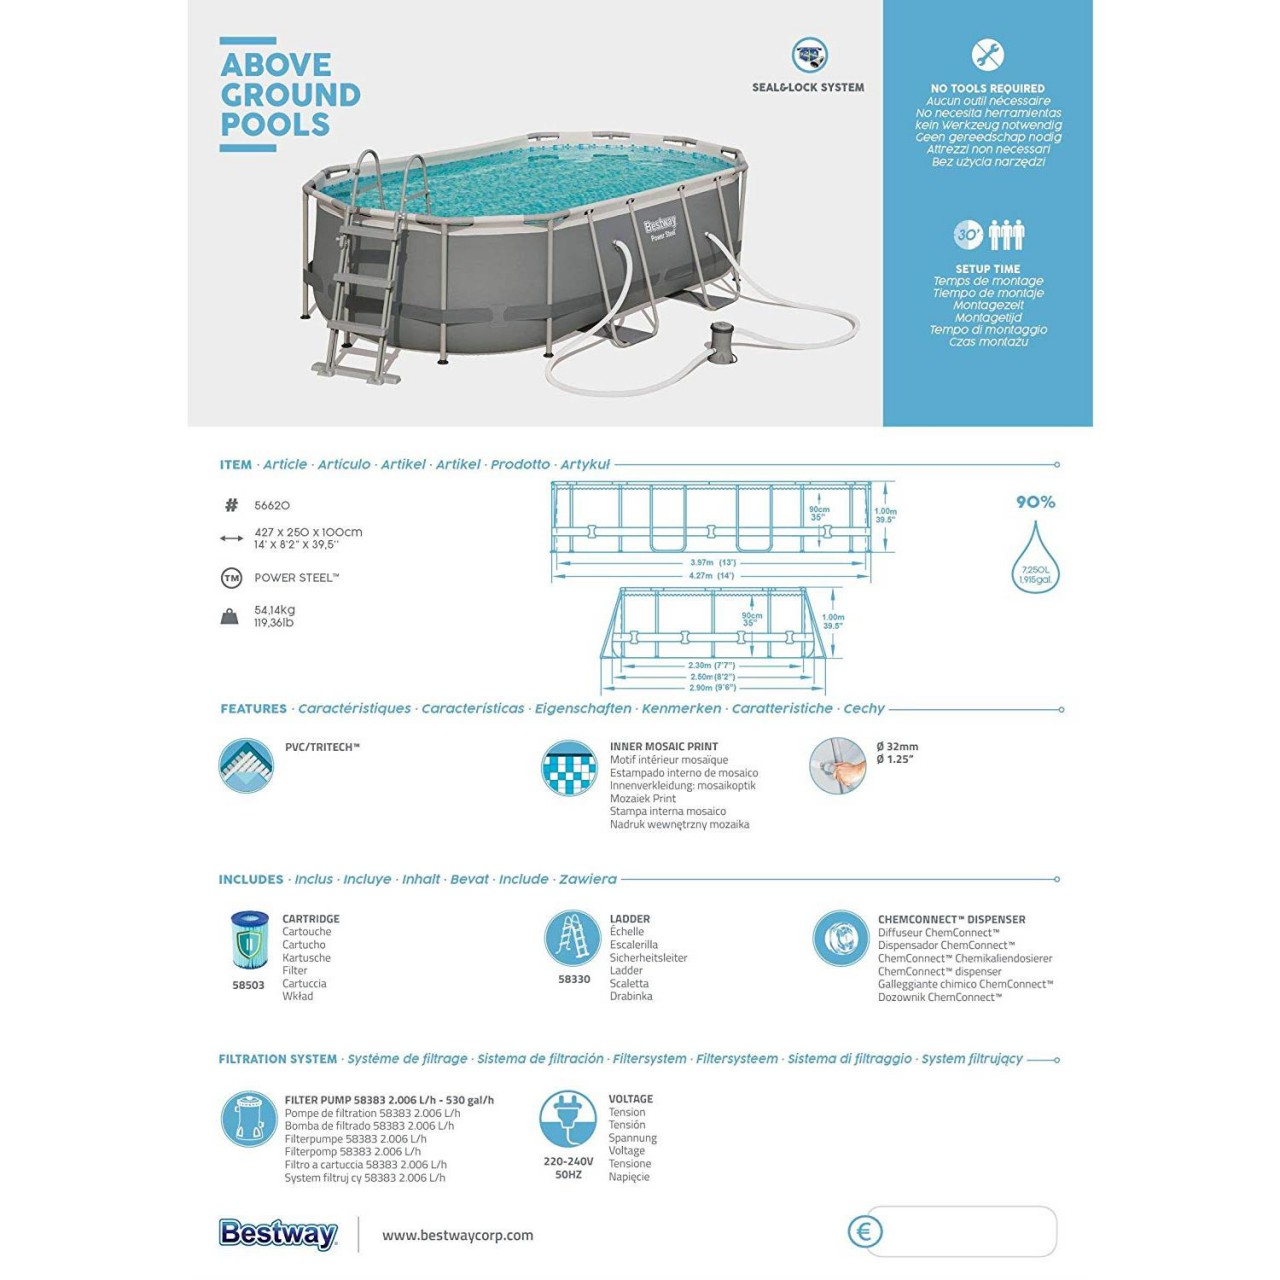 Bestway 56620 Frame Pool Power Steel Oval 424x250x100 cm Filterpumpe Leiter